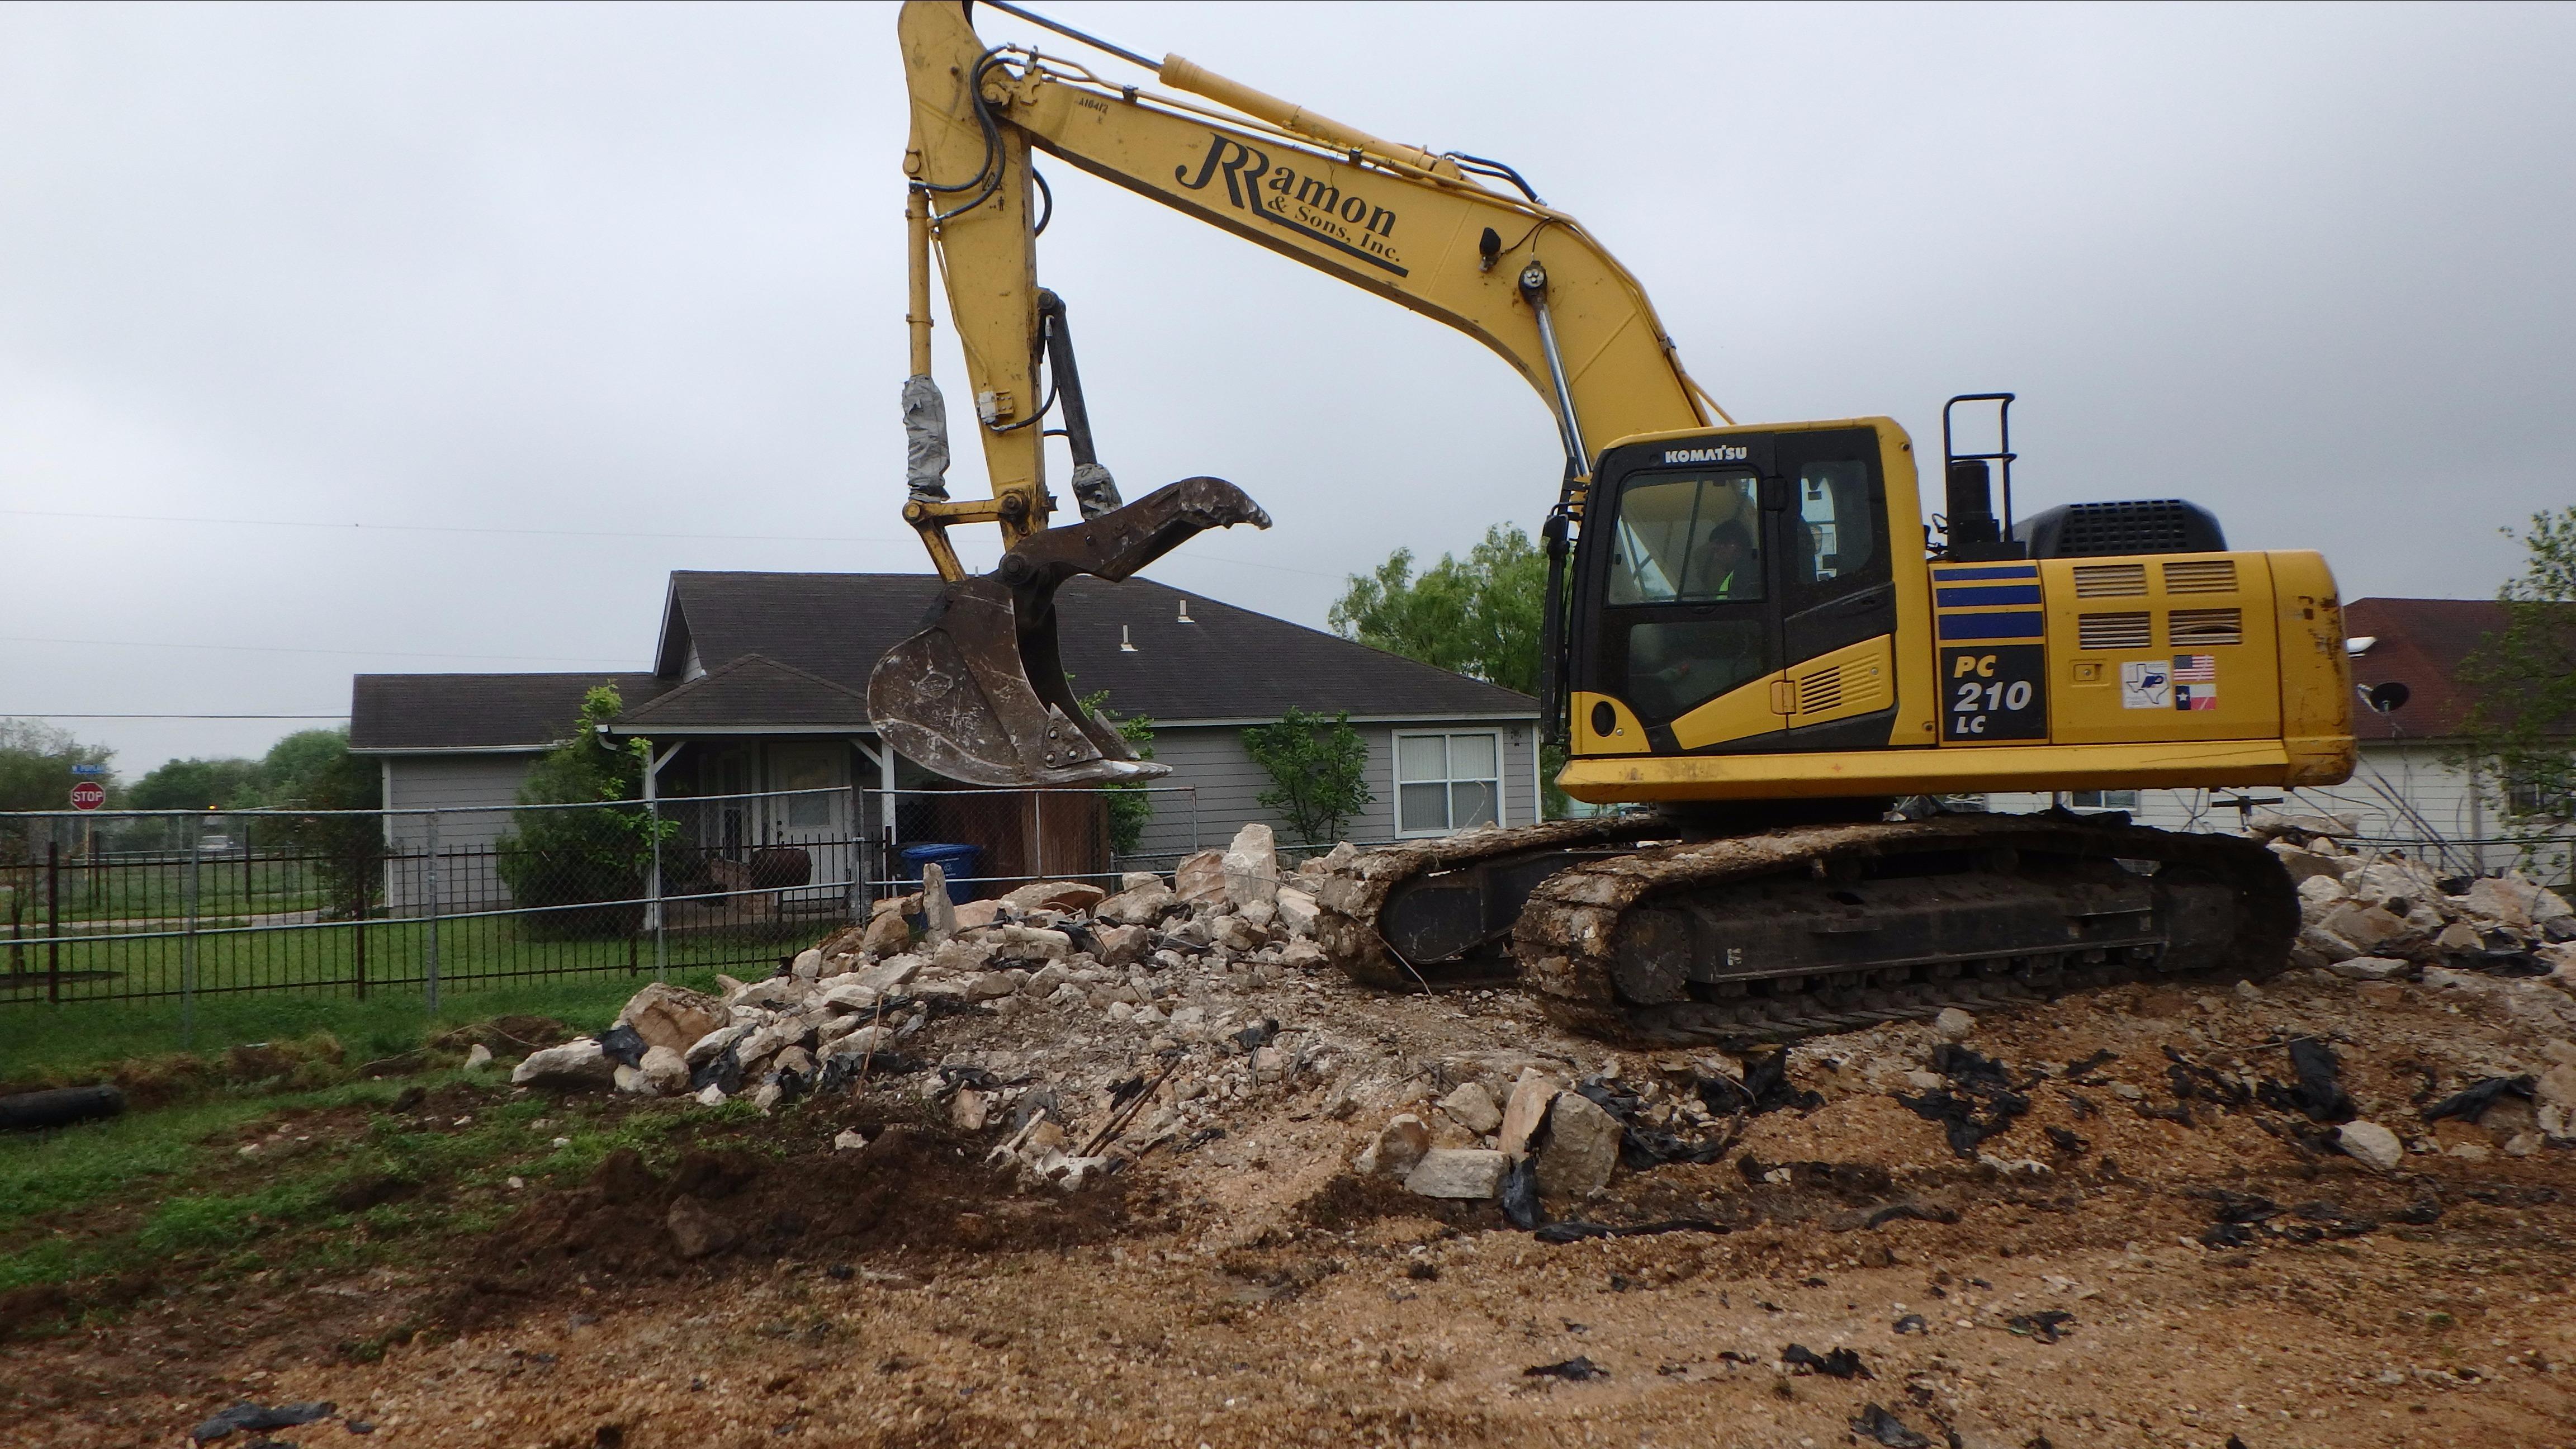 JR Ramon Demolition image 2